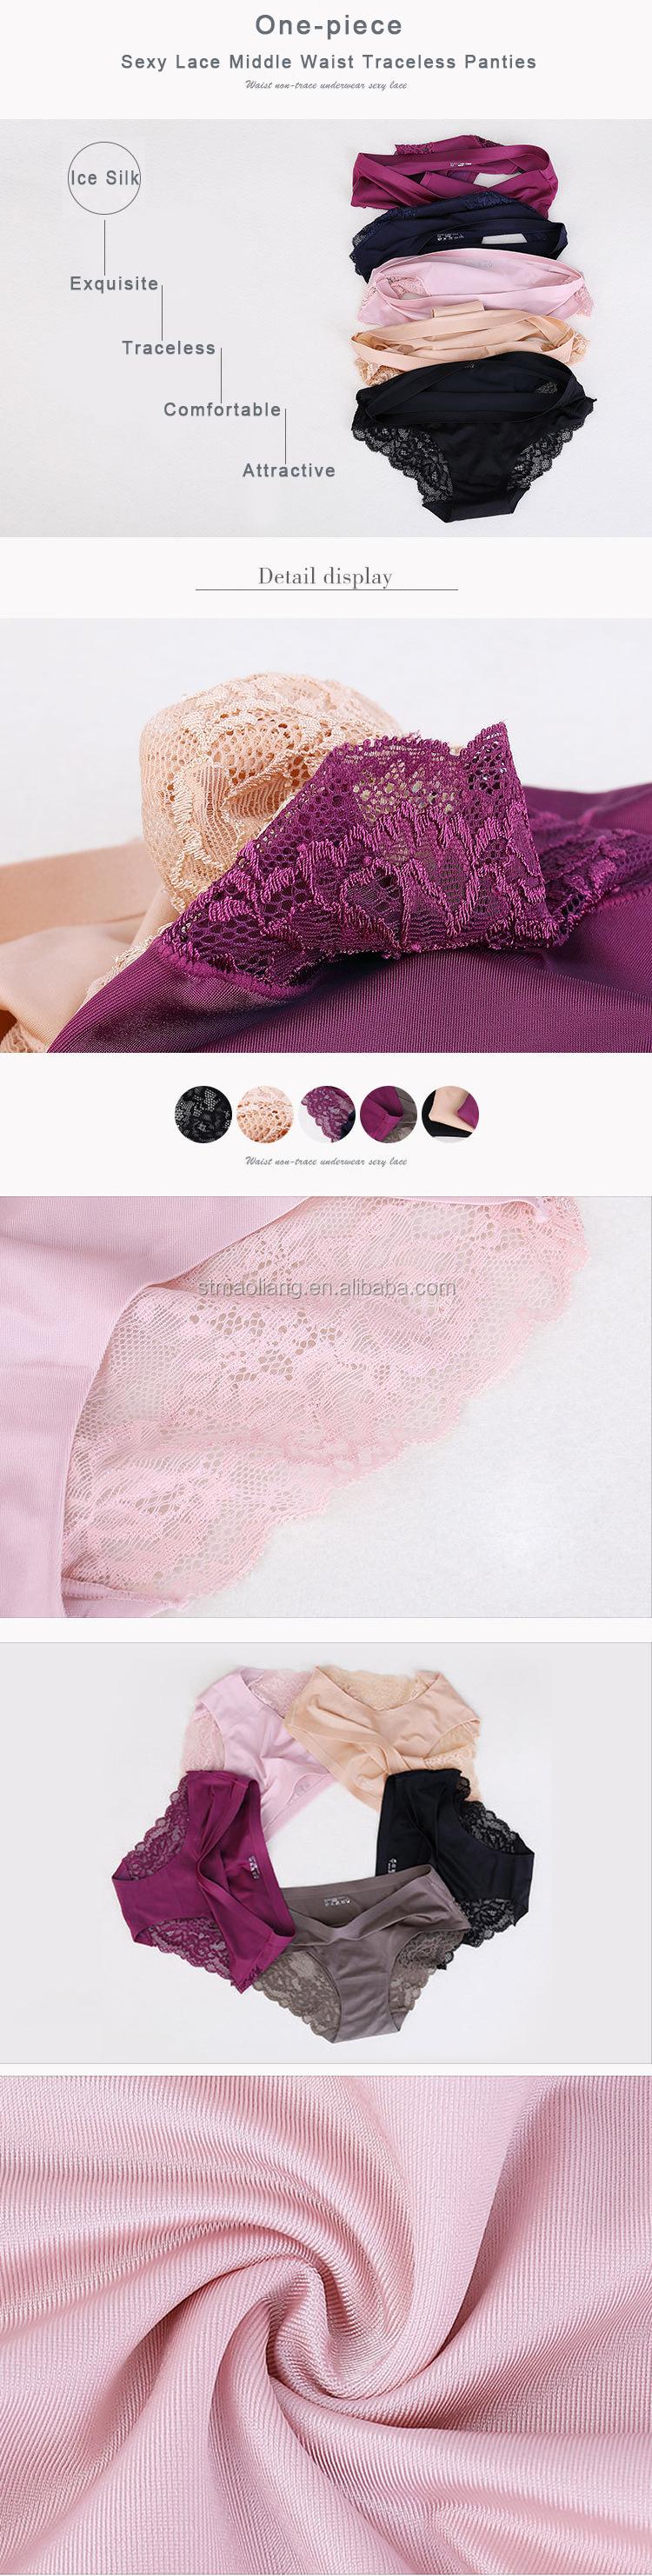 da53ef051a 1855 Ladies Sexy Satin Ice Silk Underwear Women Seamless Lace Panties